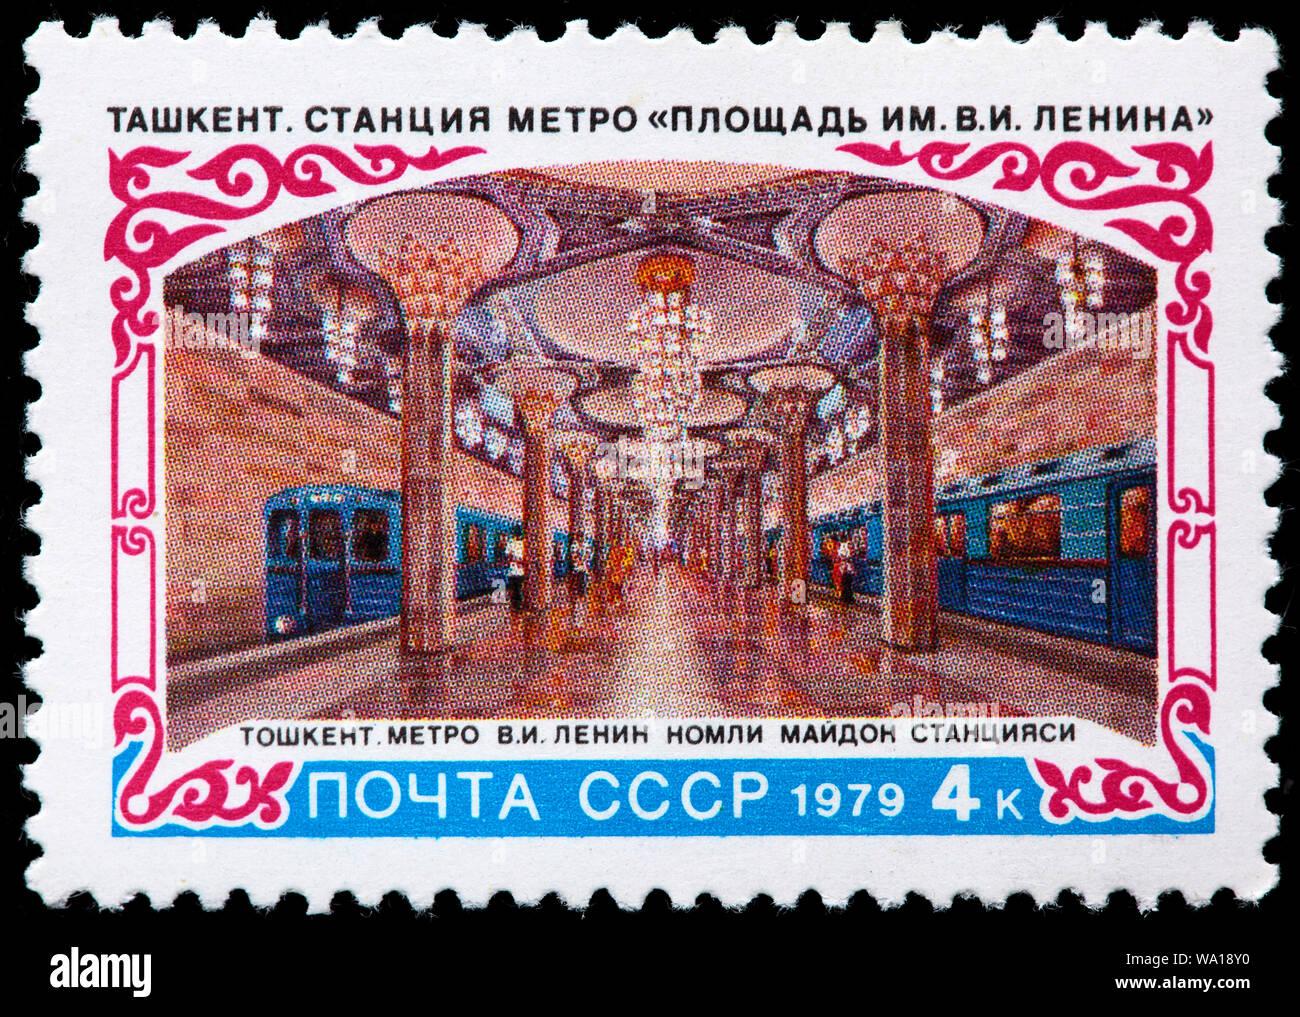 Lenin Square metro station in Tashkent, Usbekistan, postage stamp, Russia, USSR, 1979 Stock Photo